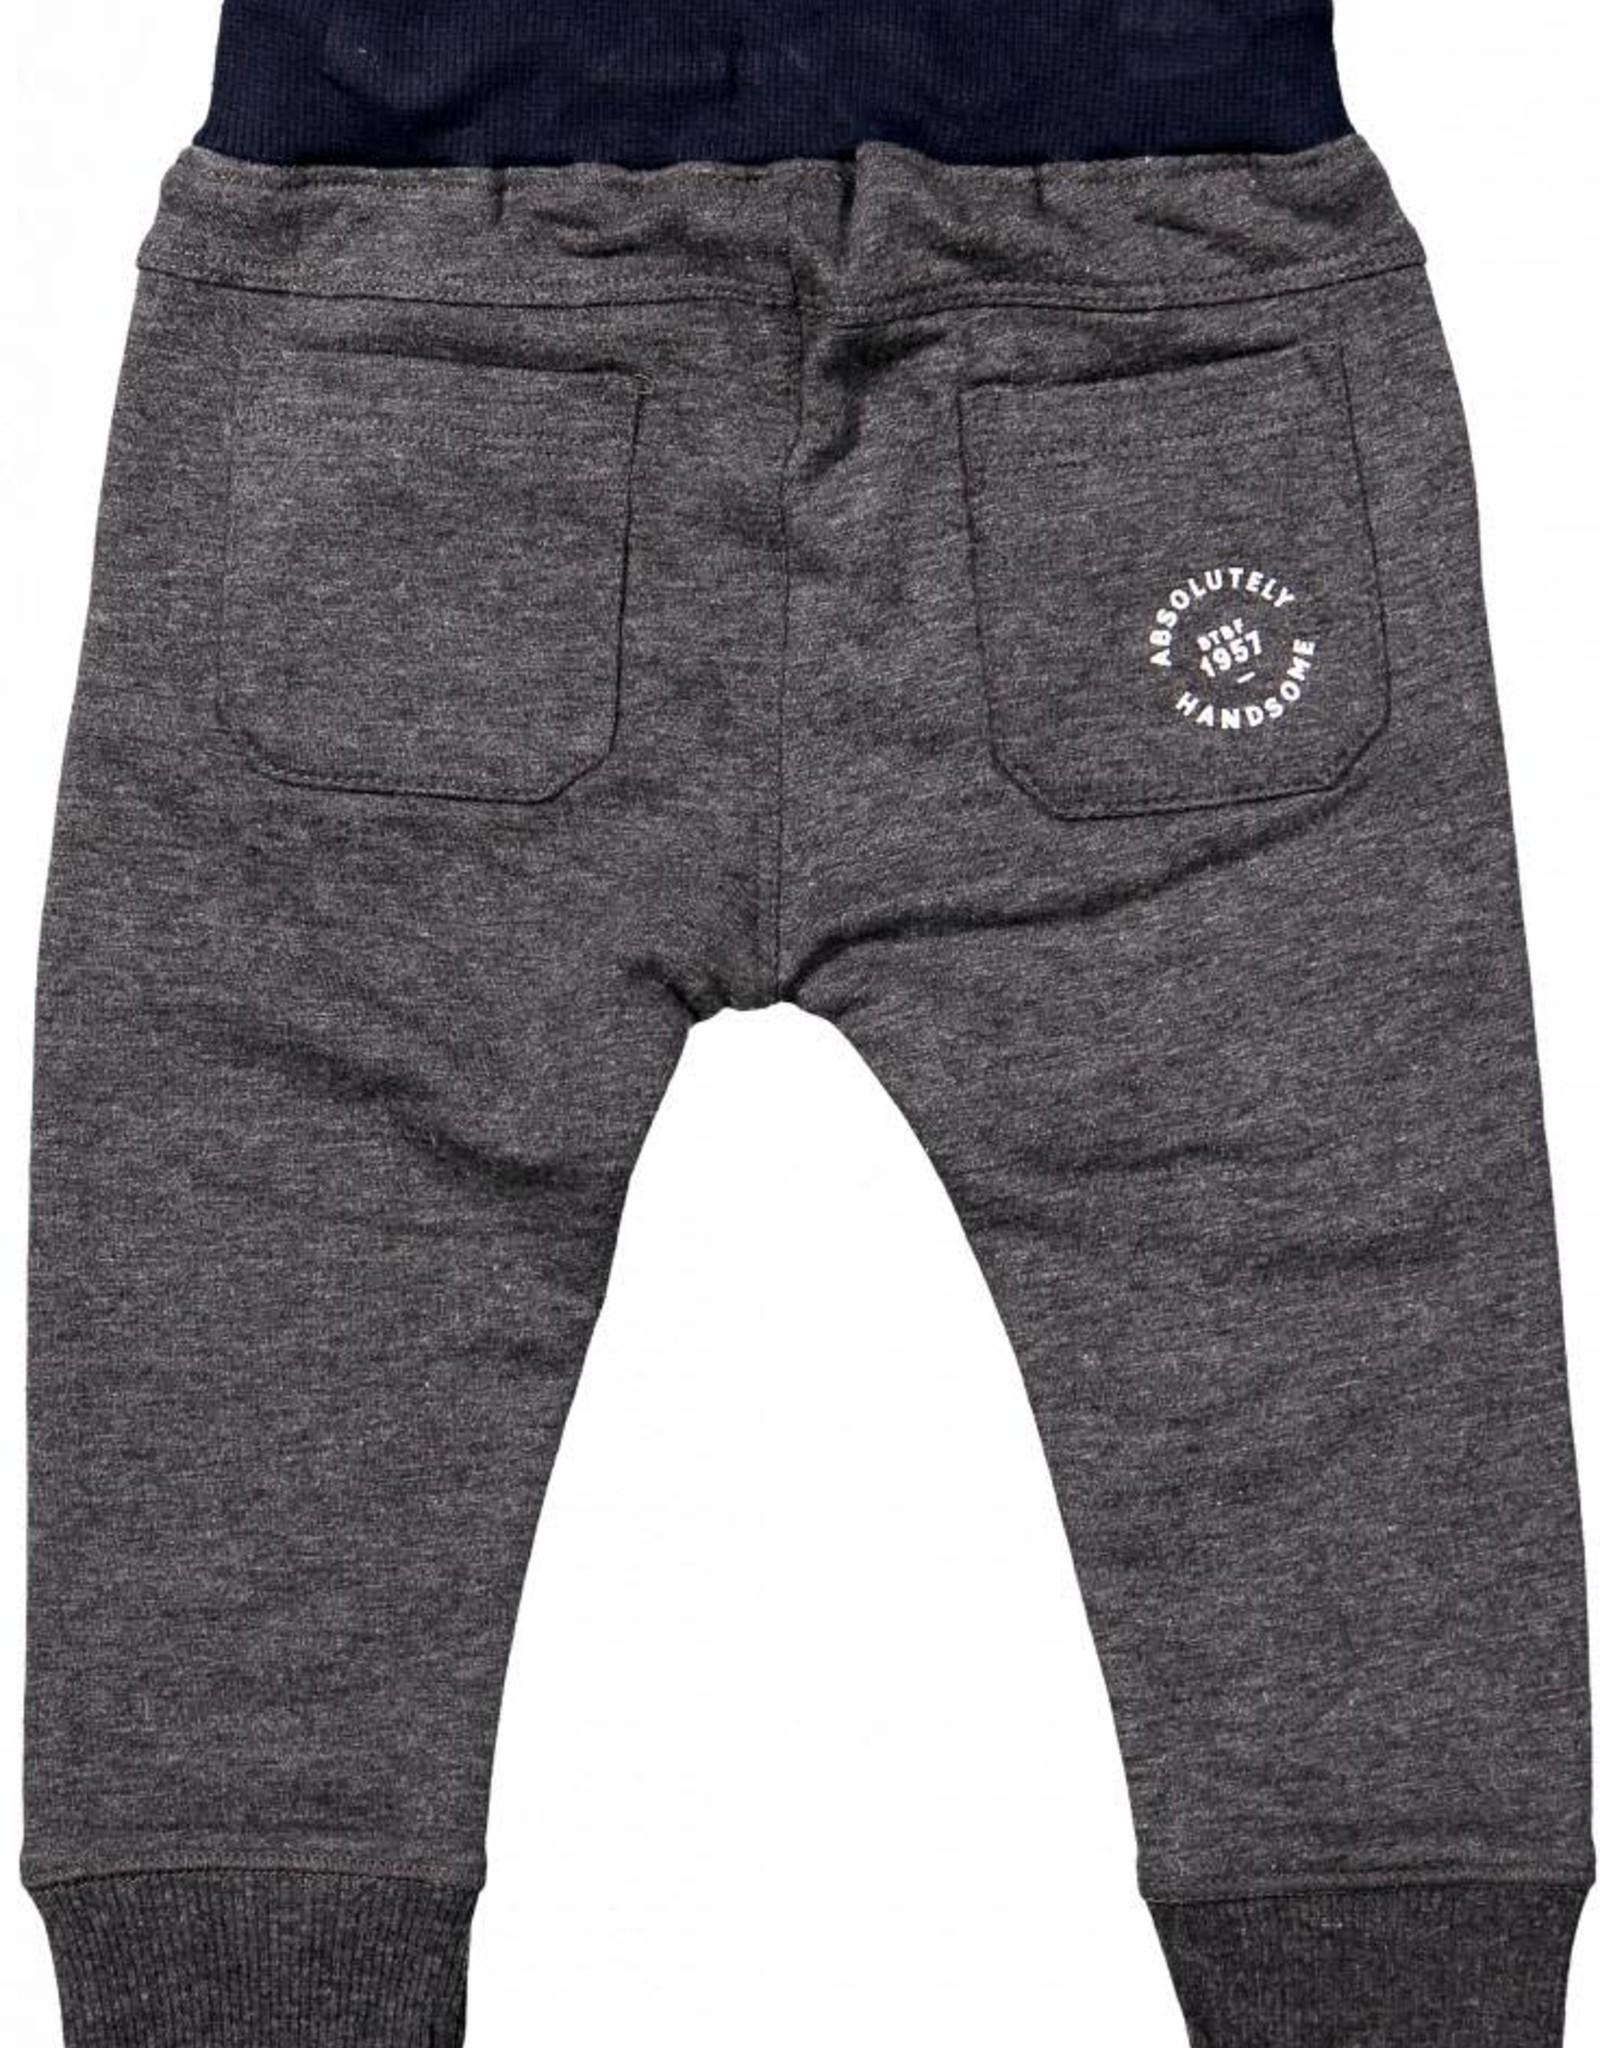 Born to be famous Pants Dark Grey Melange